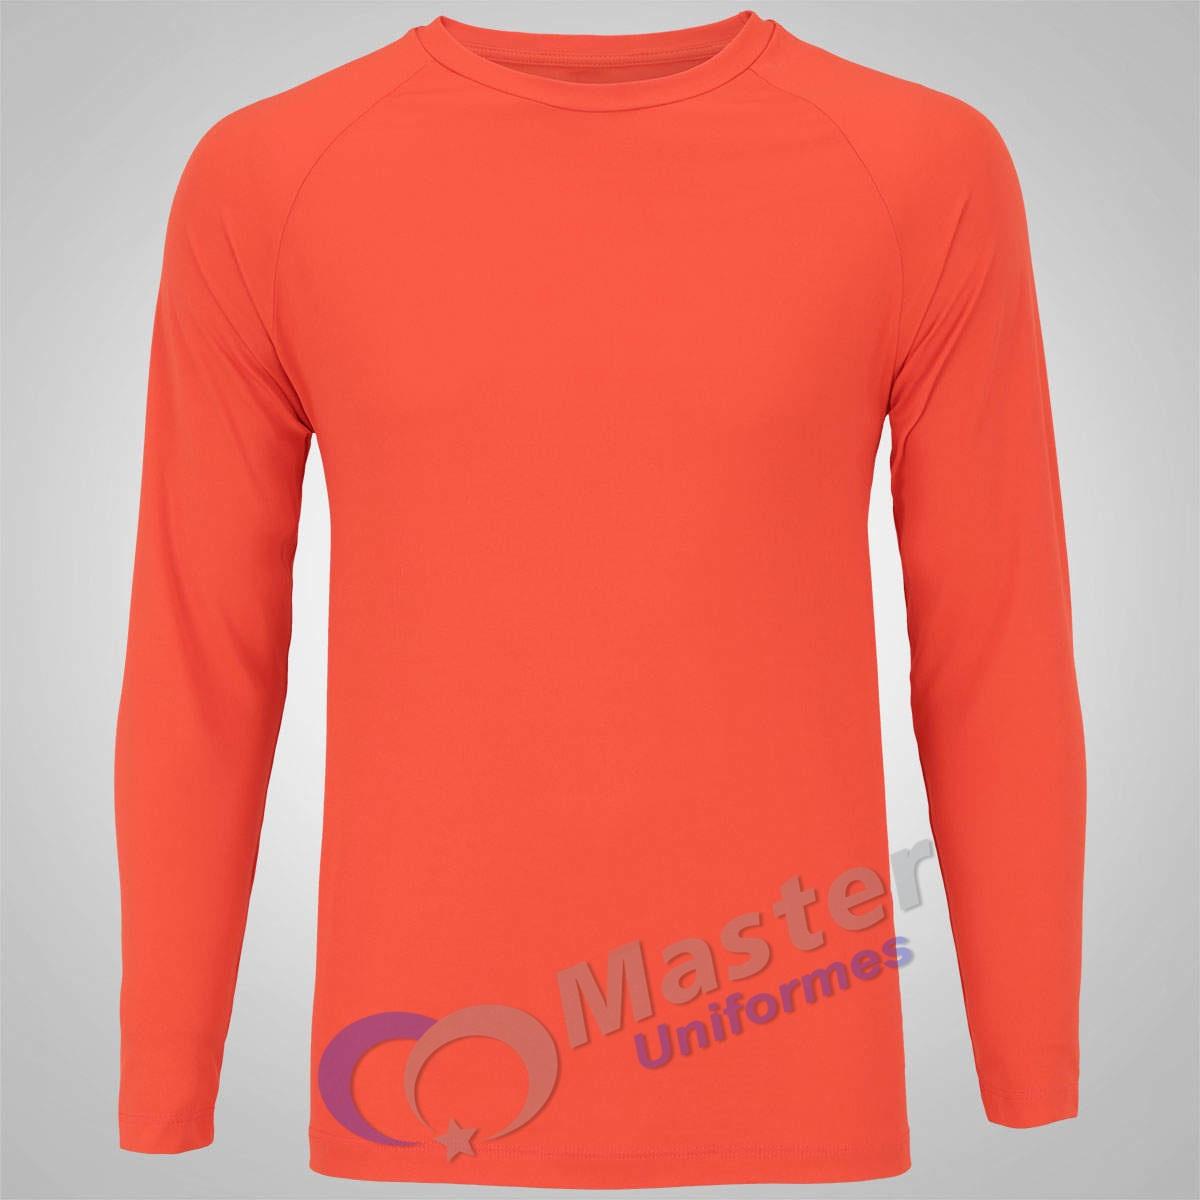 camiseta-manga-longa-com-protecao-solar-oxer-custom-masculina-img